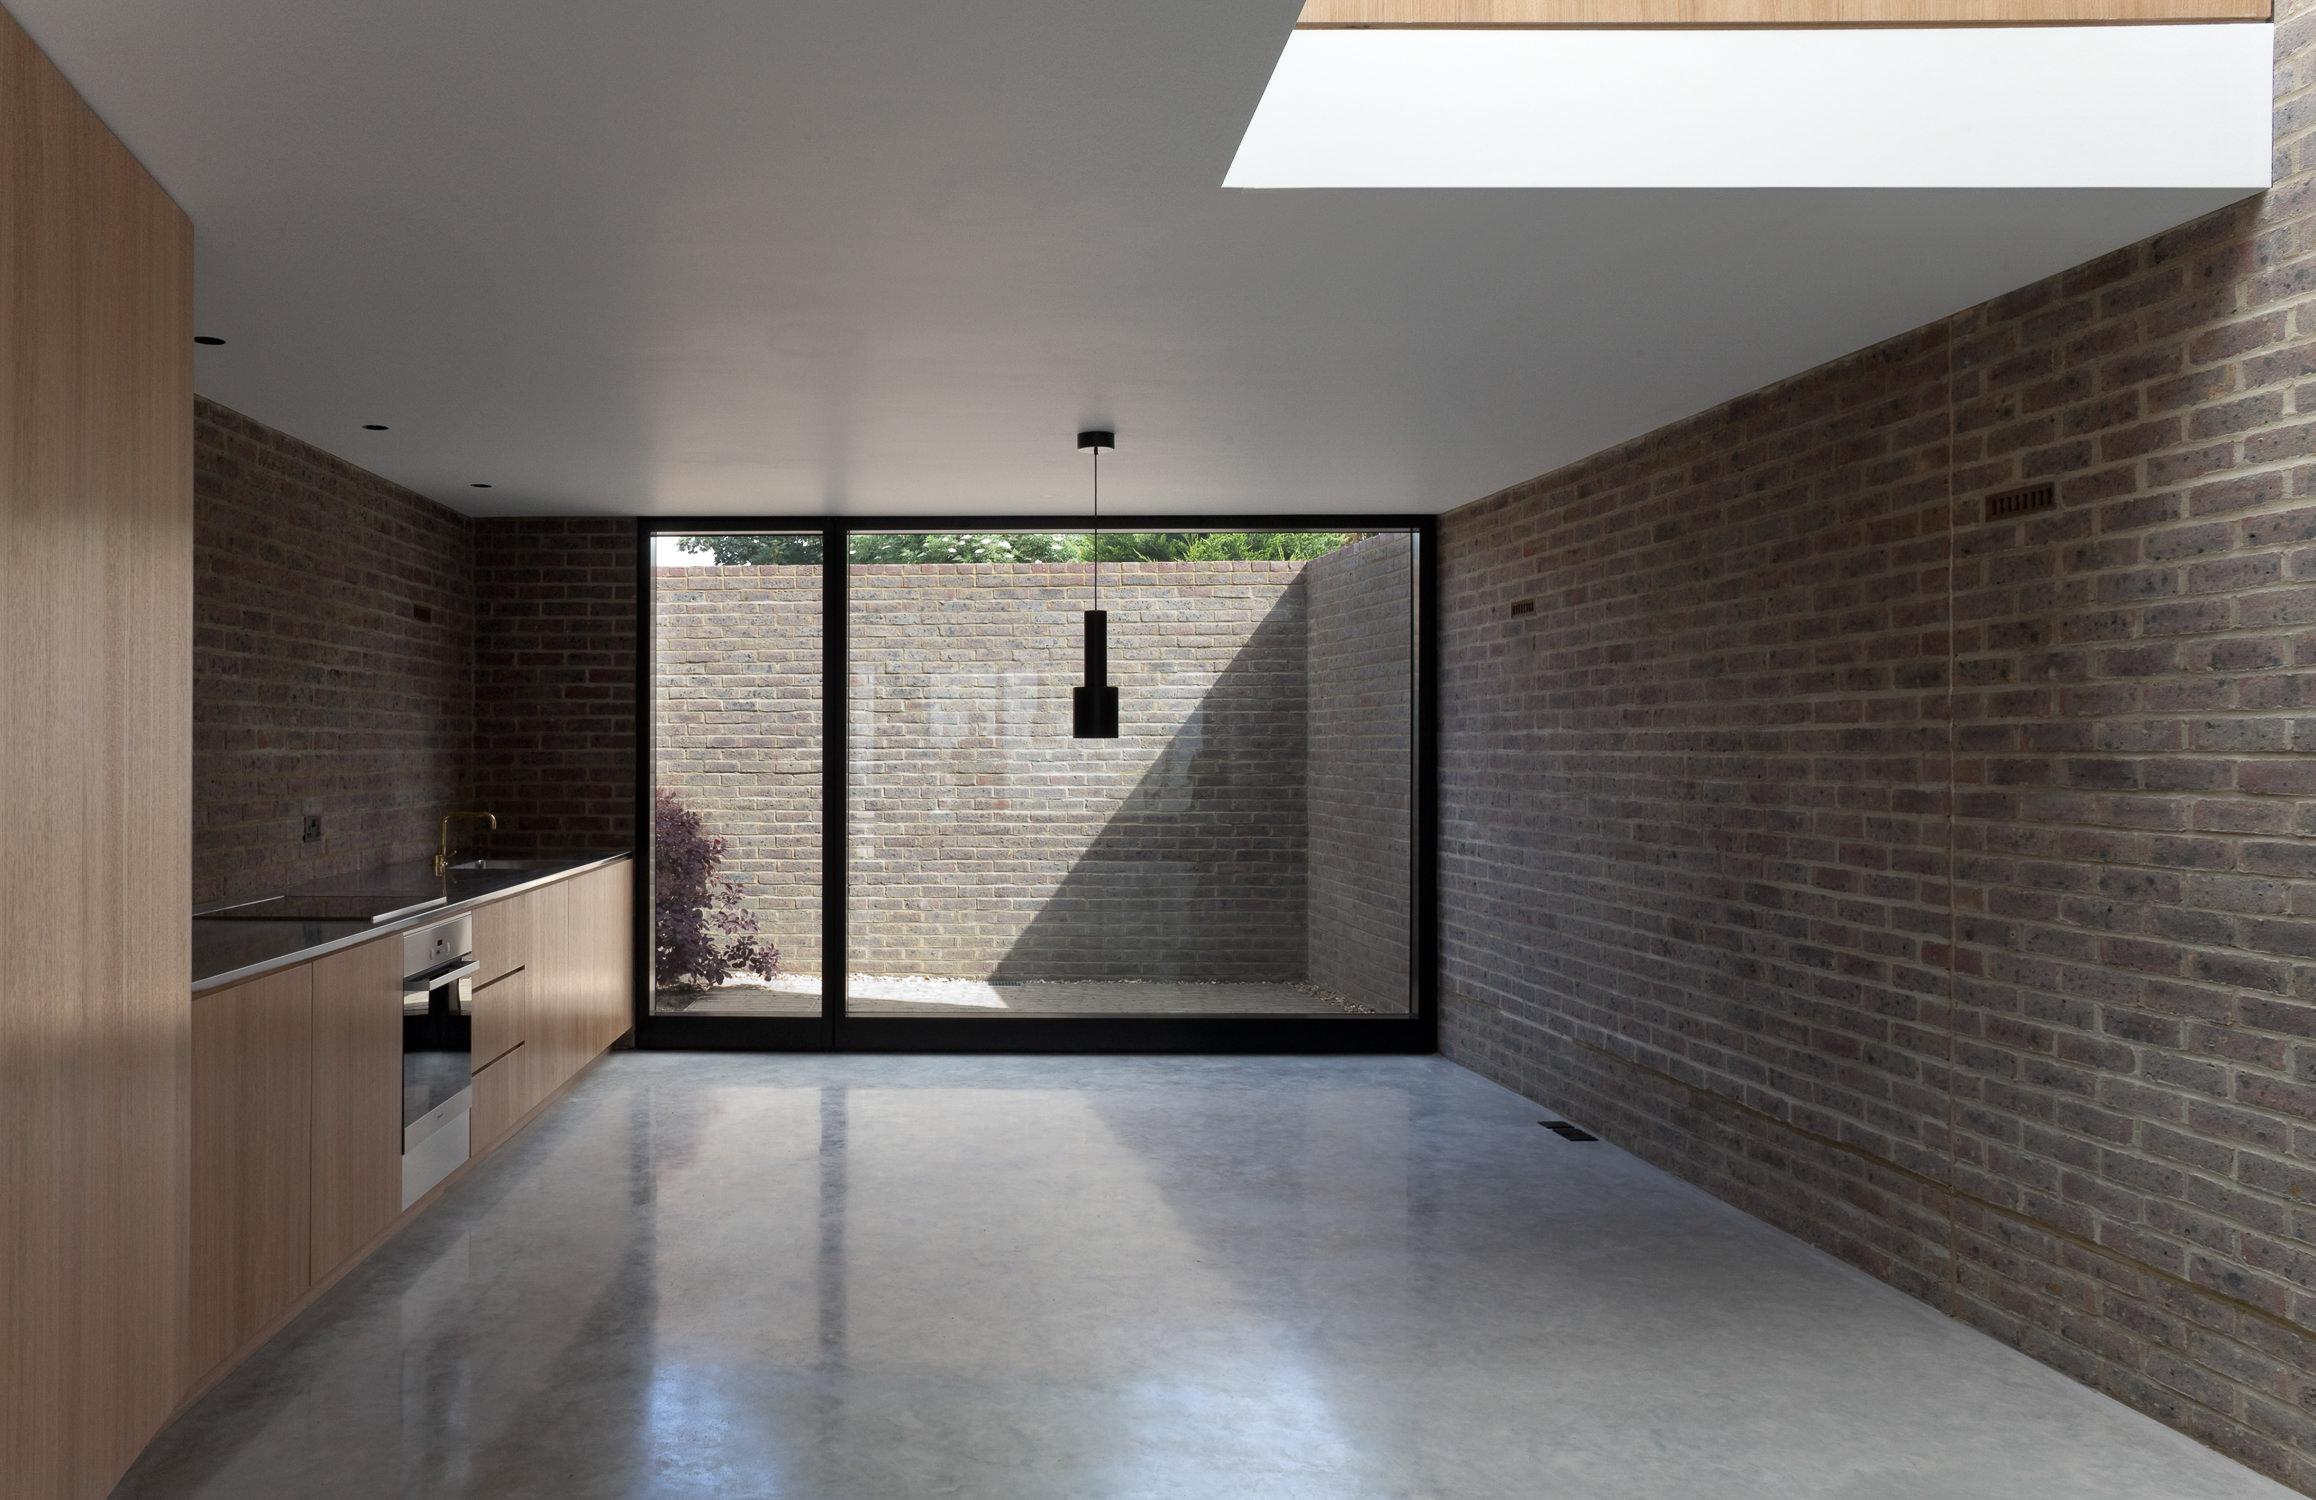 mark-hadden-architecture-photographer-architectuur-interieur-fotografie-london-amsterdam-Kings Avenue_© MH 34.jpg